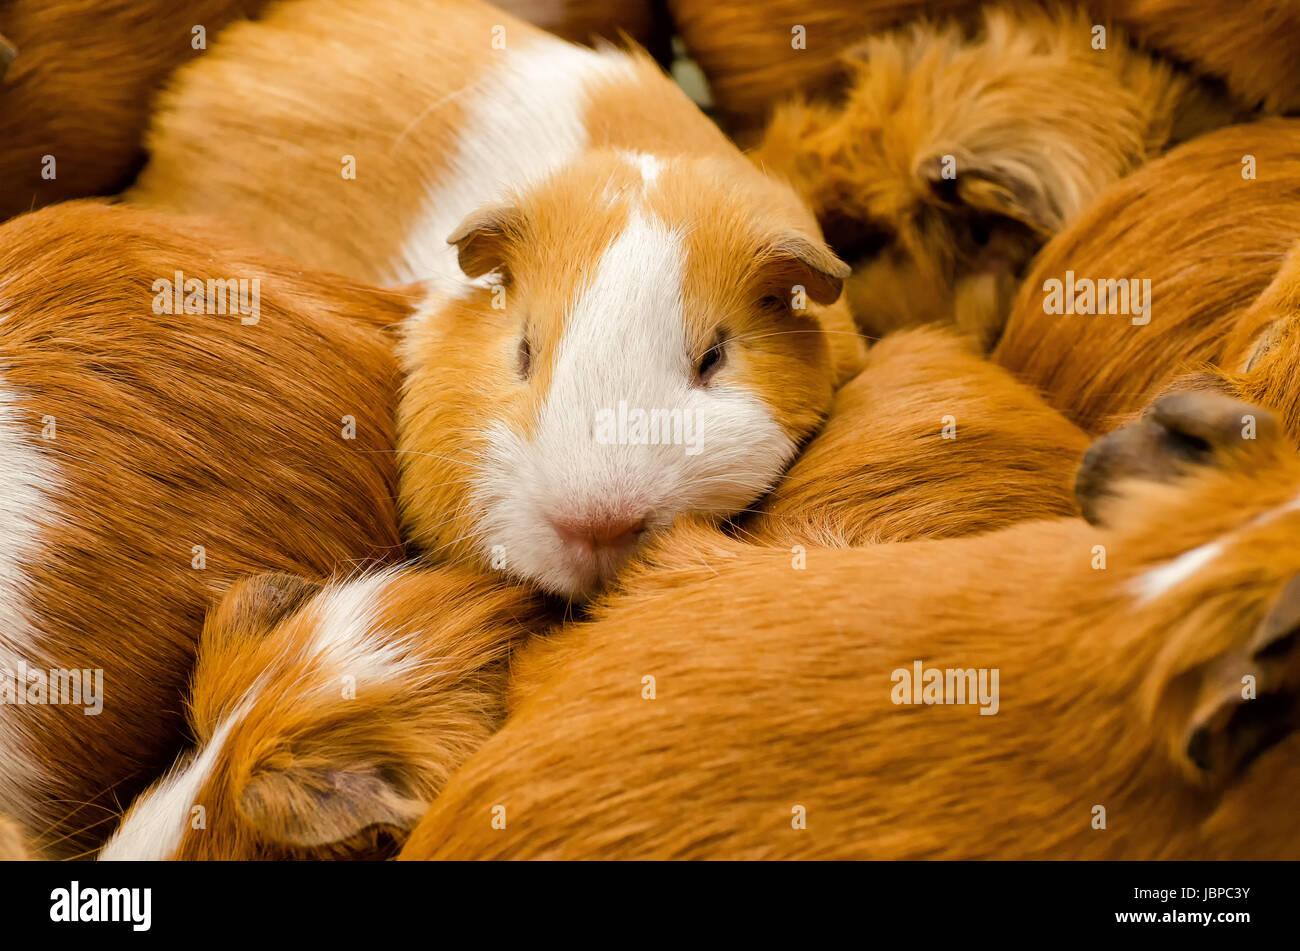 guinea pig on a market in ecuador - Stock Image